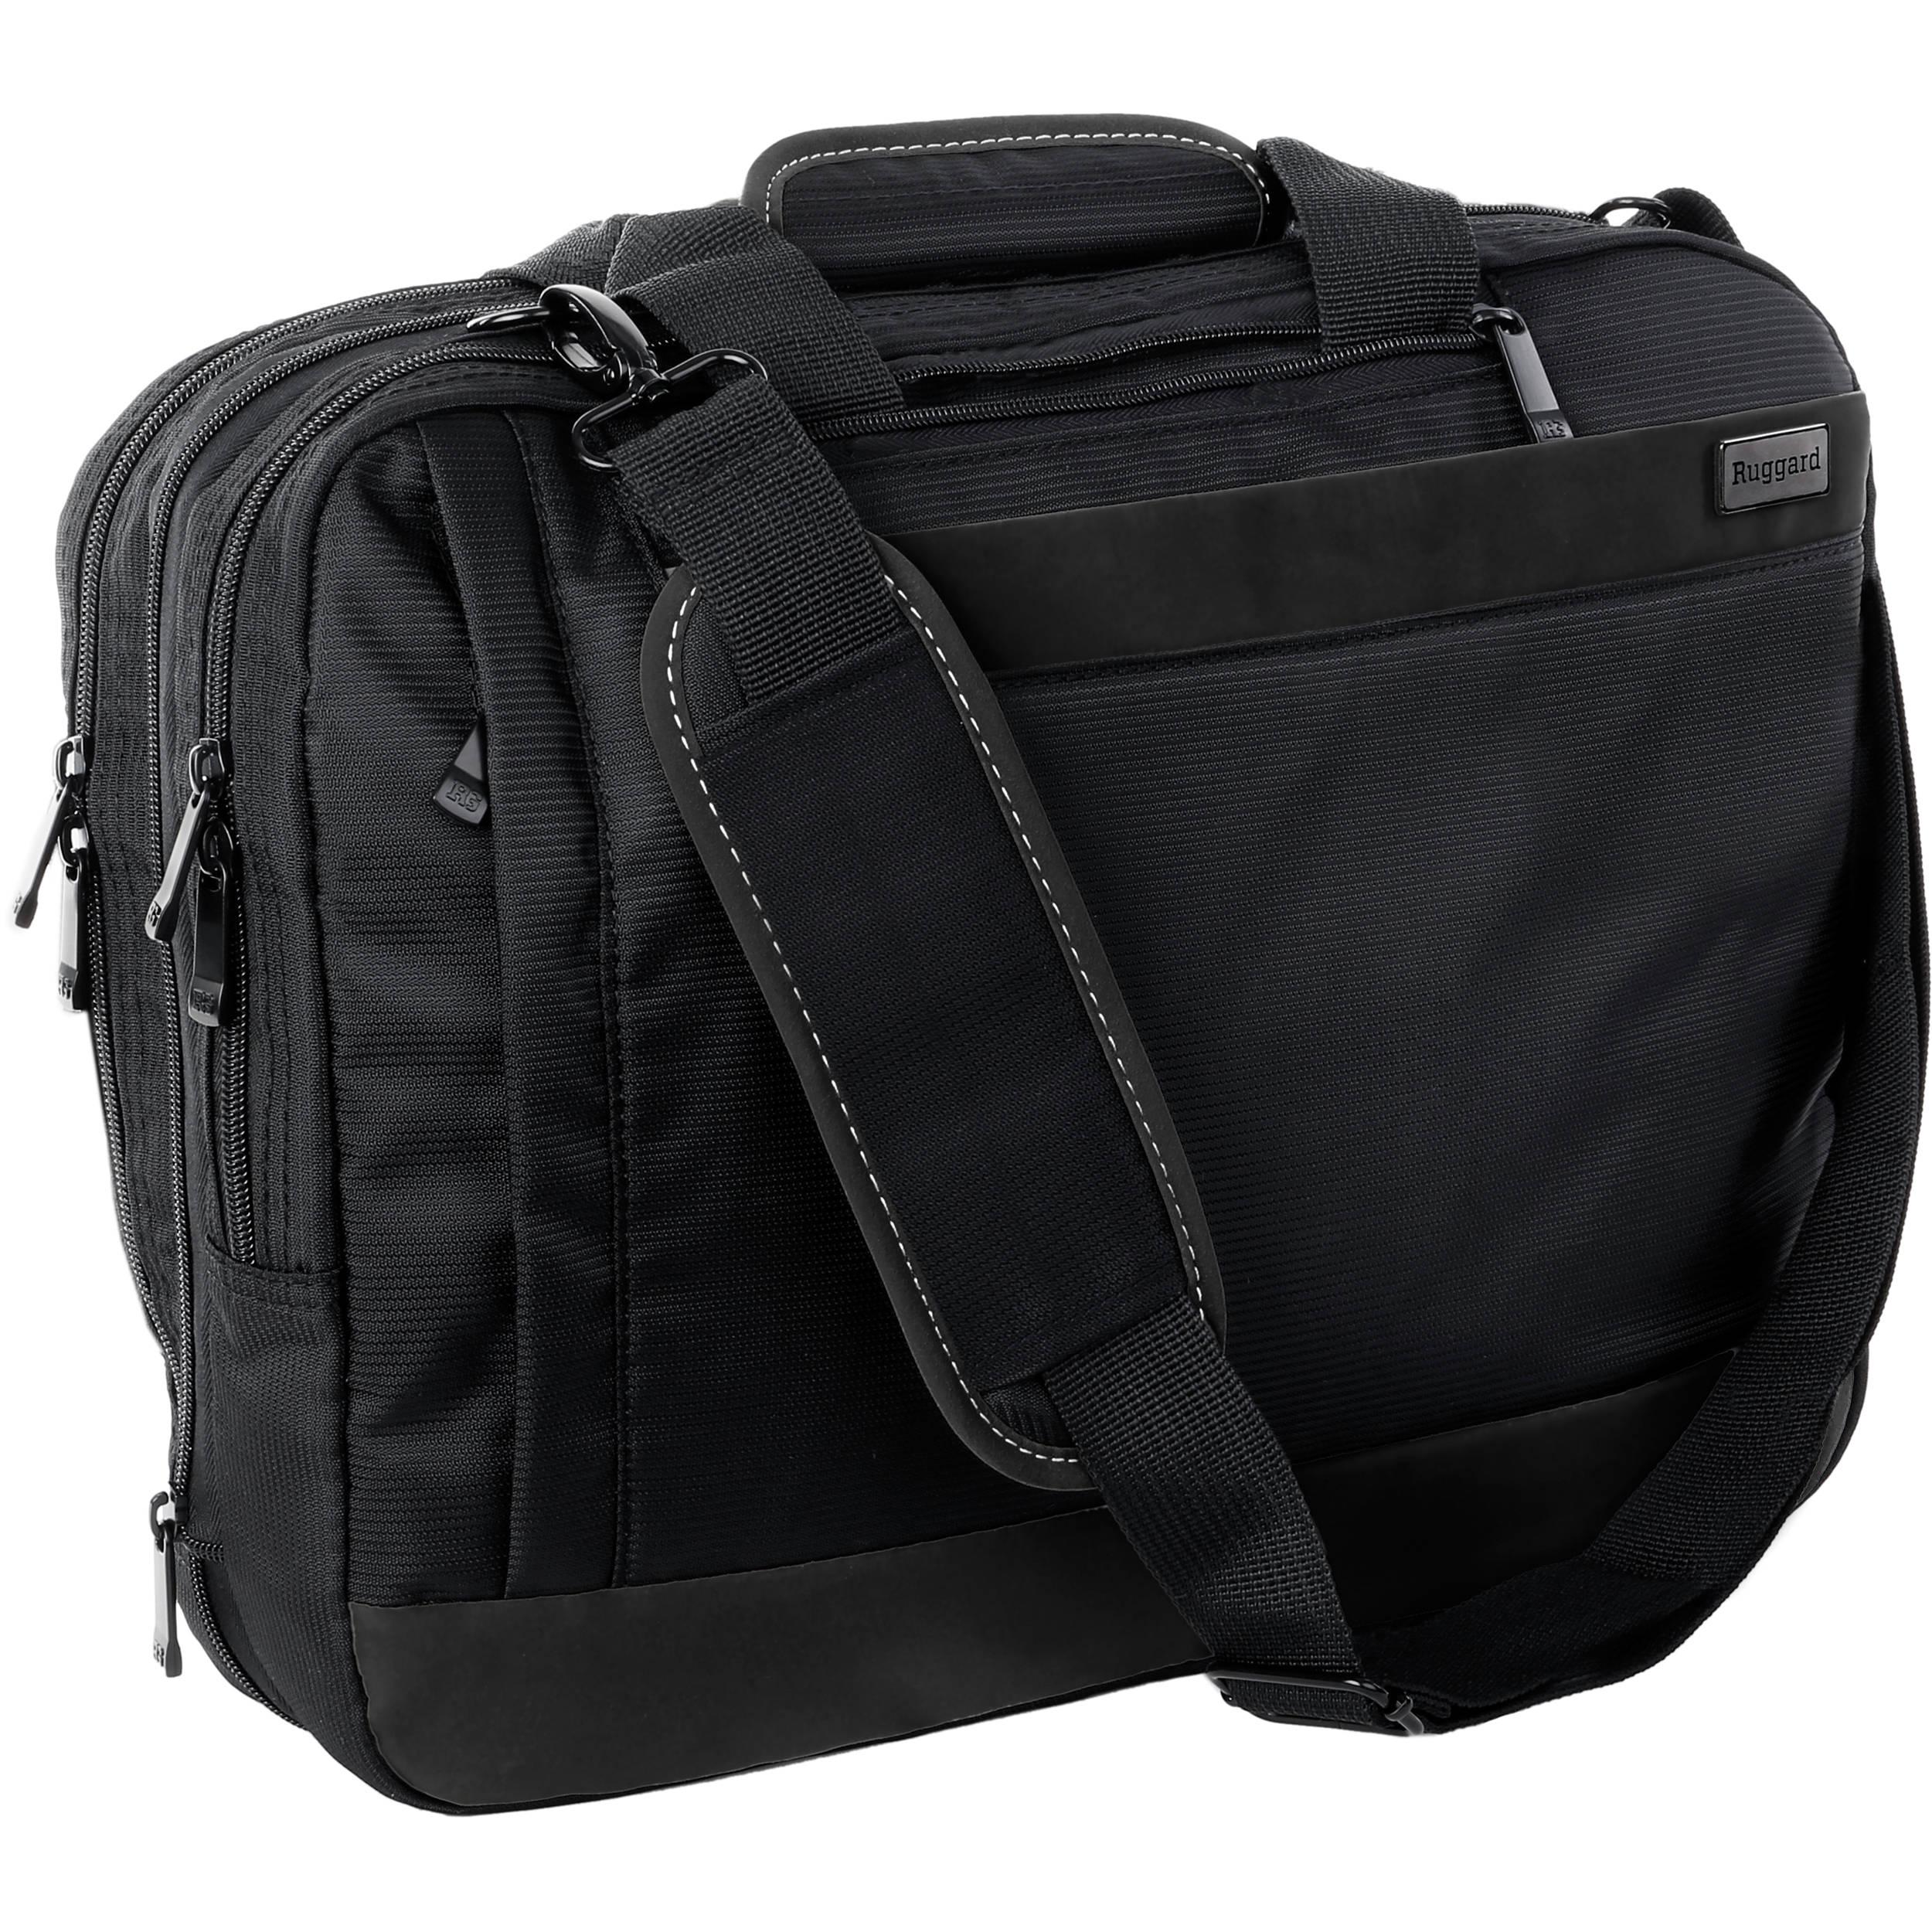 Ruggard Convertible Laptop Case (Black) LBB-102 B&H Photo Video